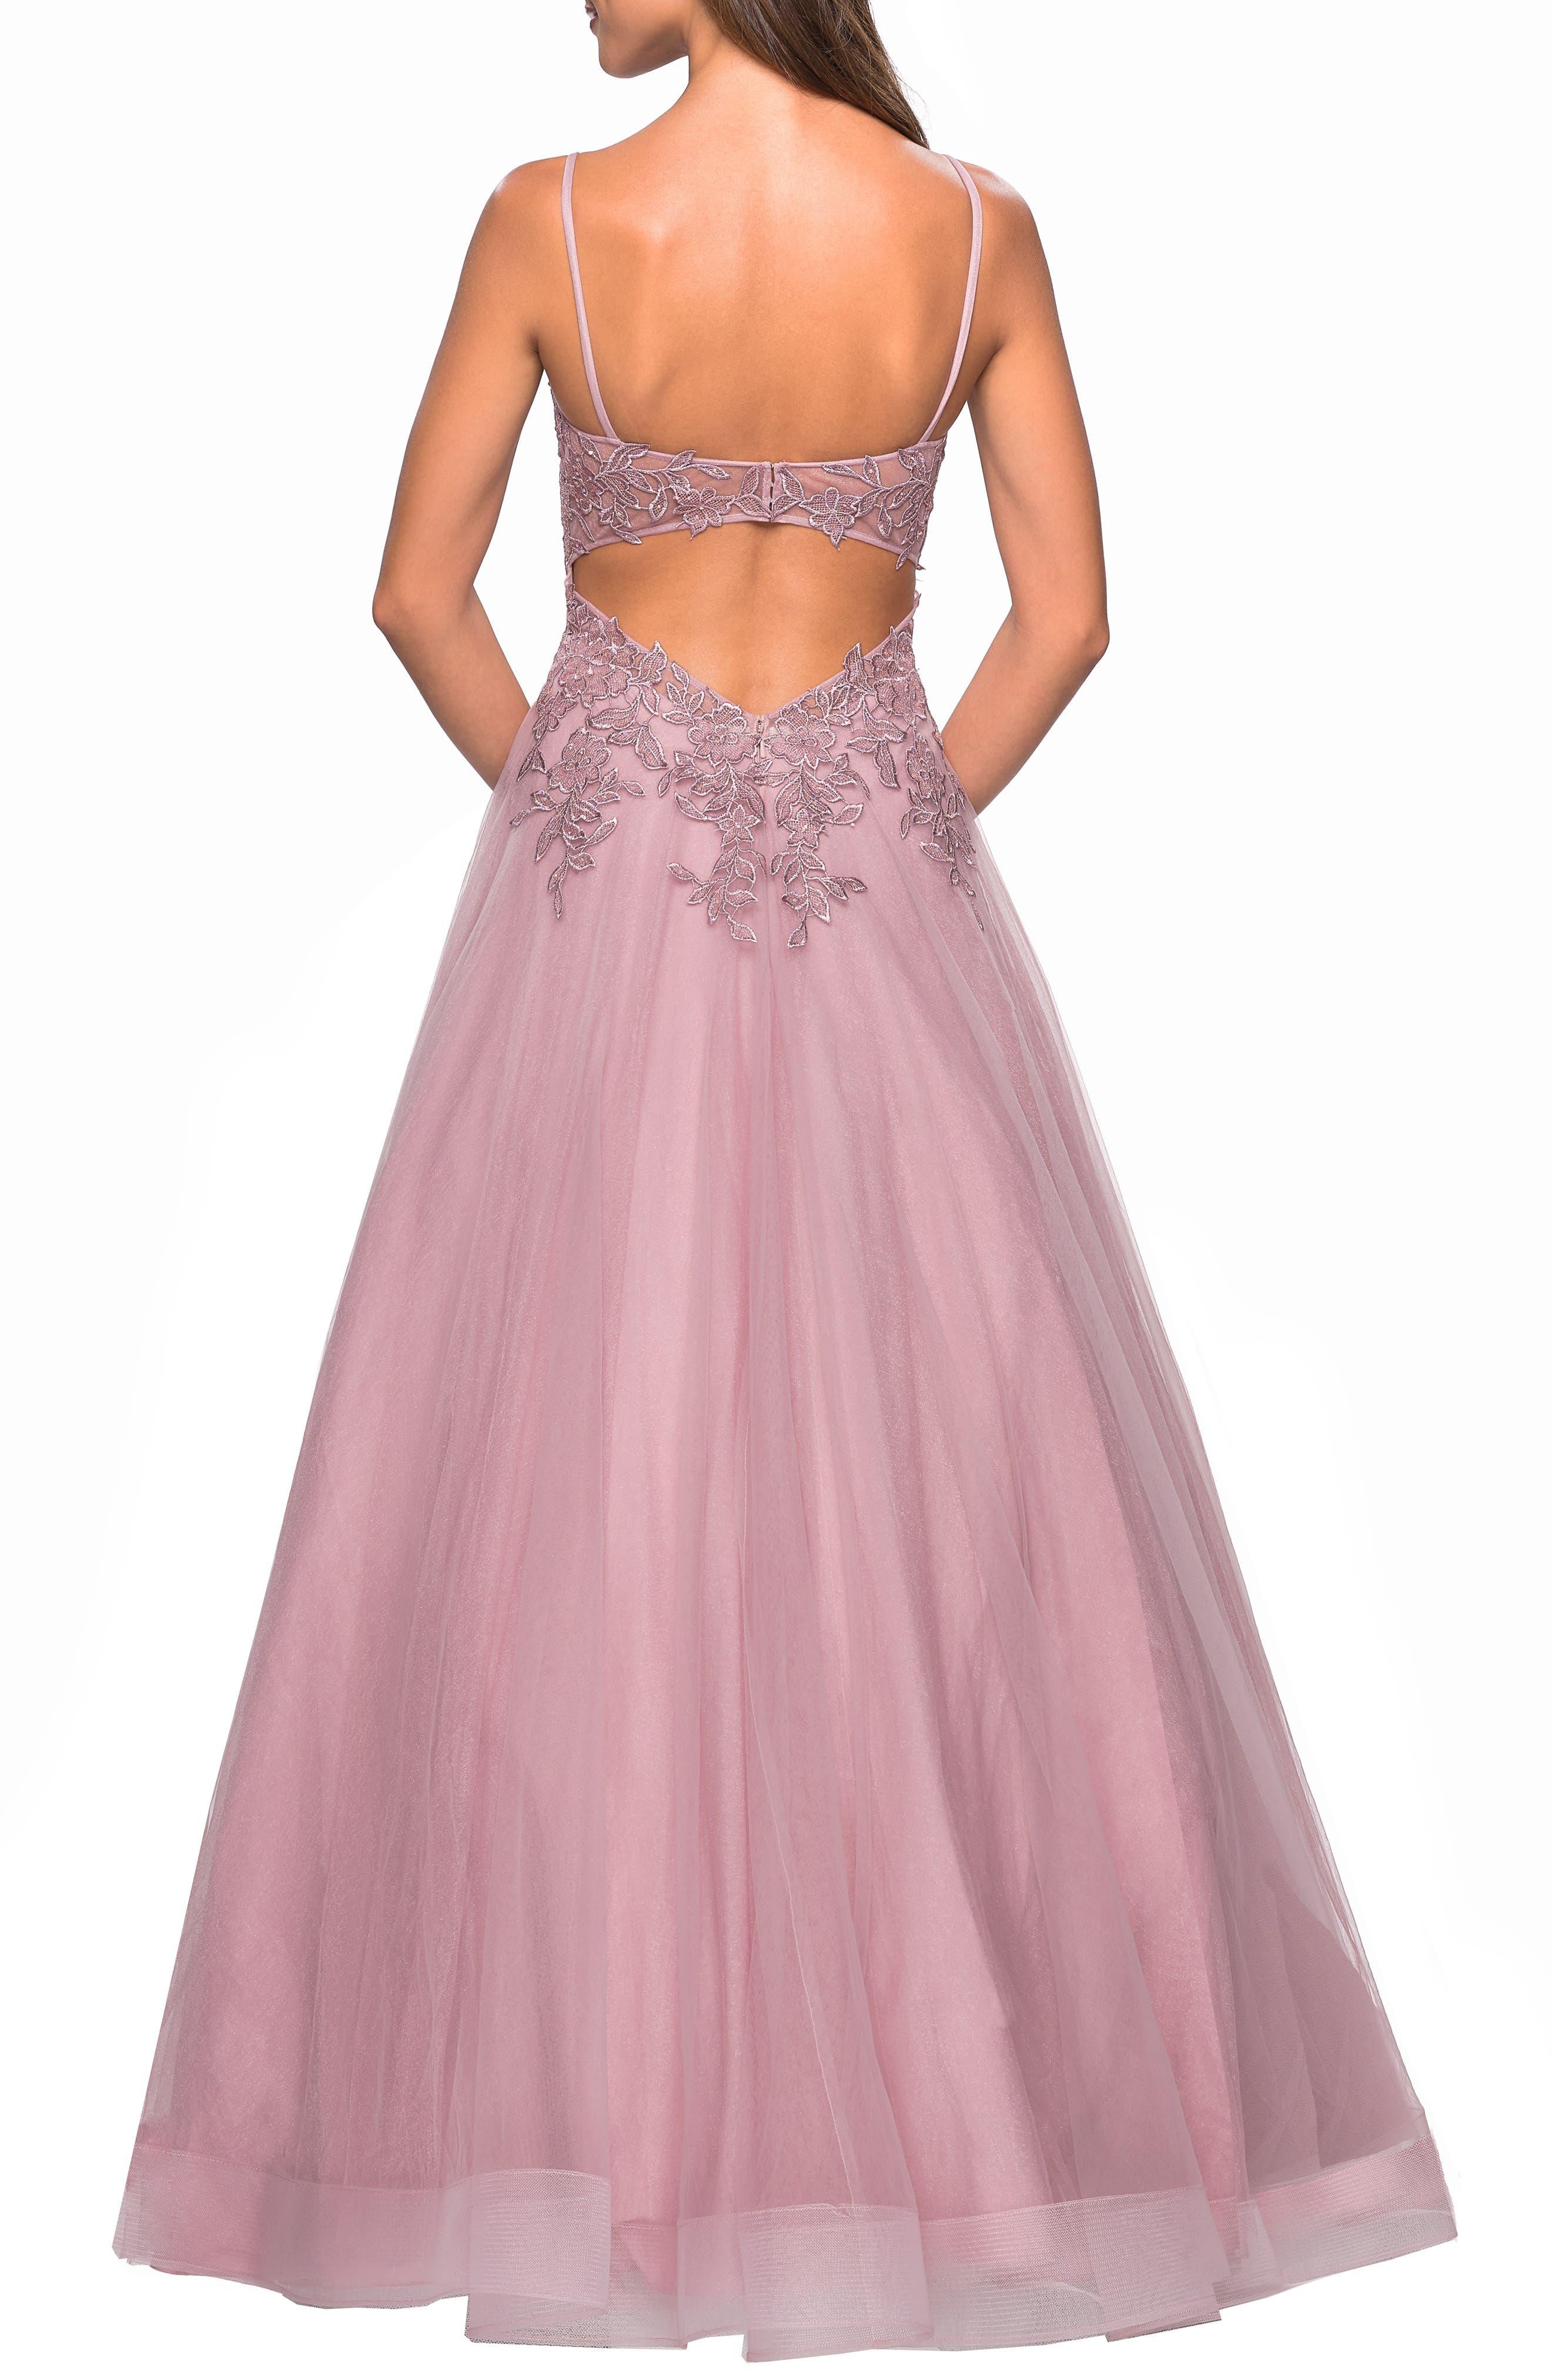 LA FEMME,                             Lace & Tulle Flared Skirt Evening Dress,                             Alternate thumbnail 2, color,                             MAUVE